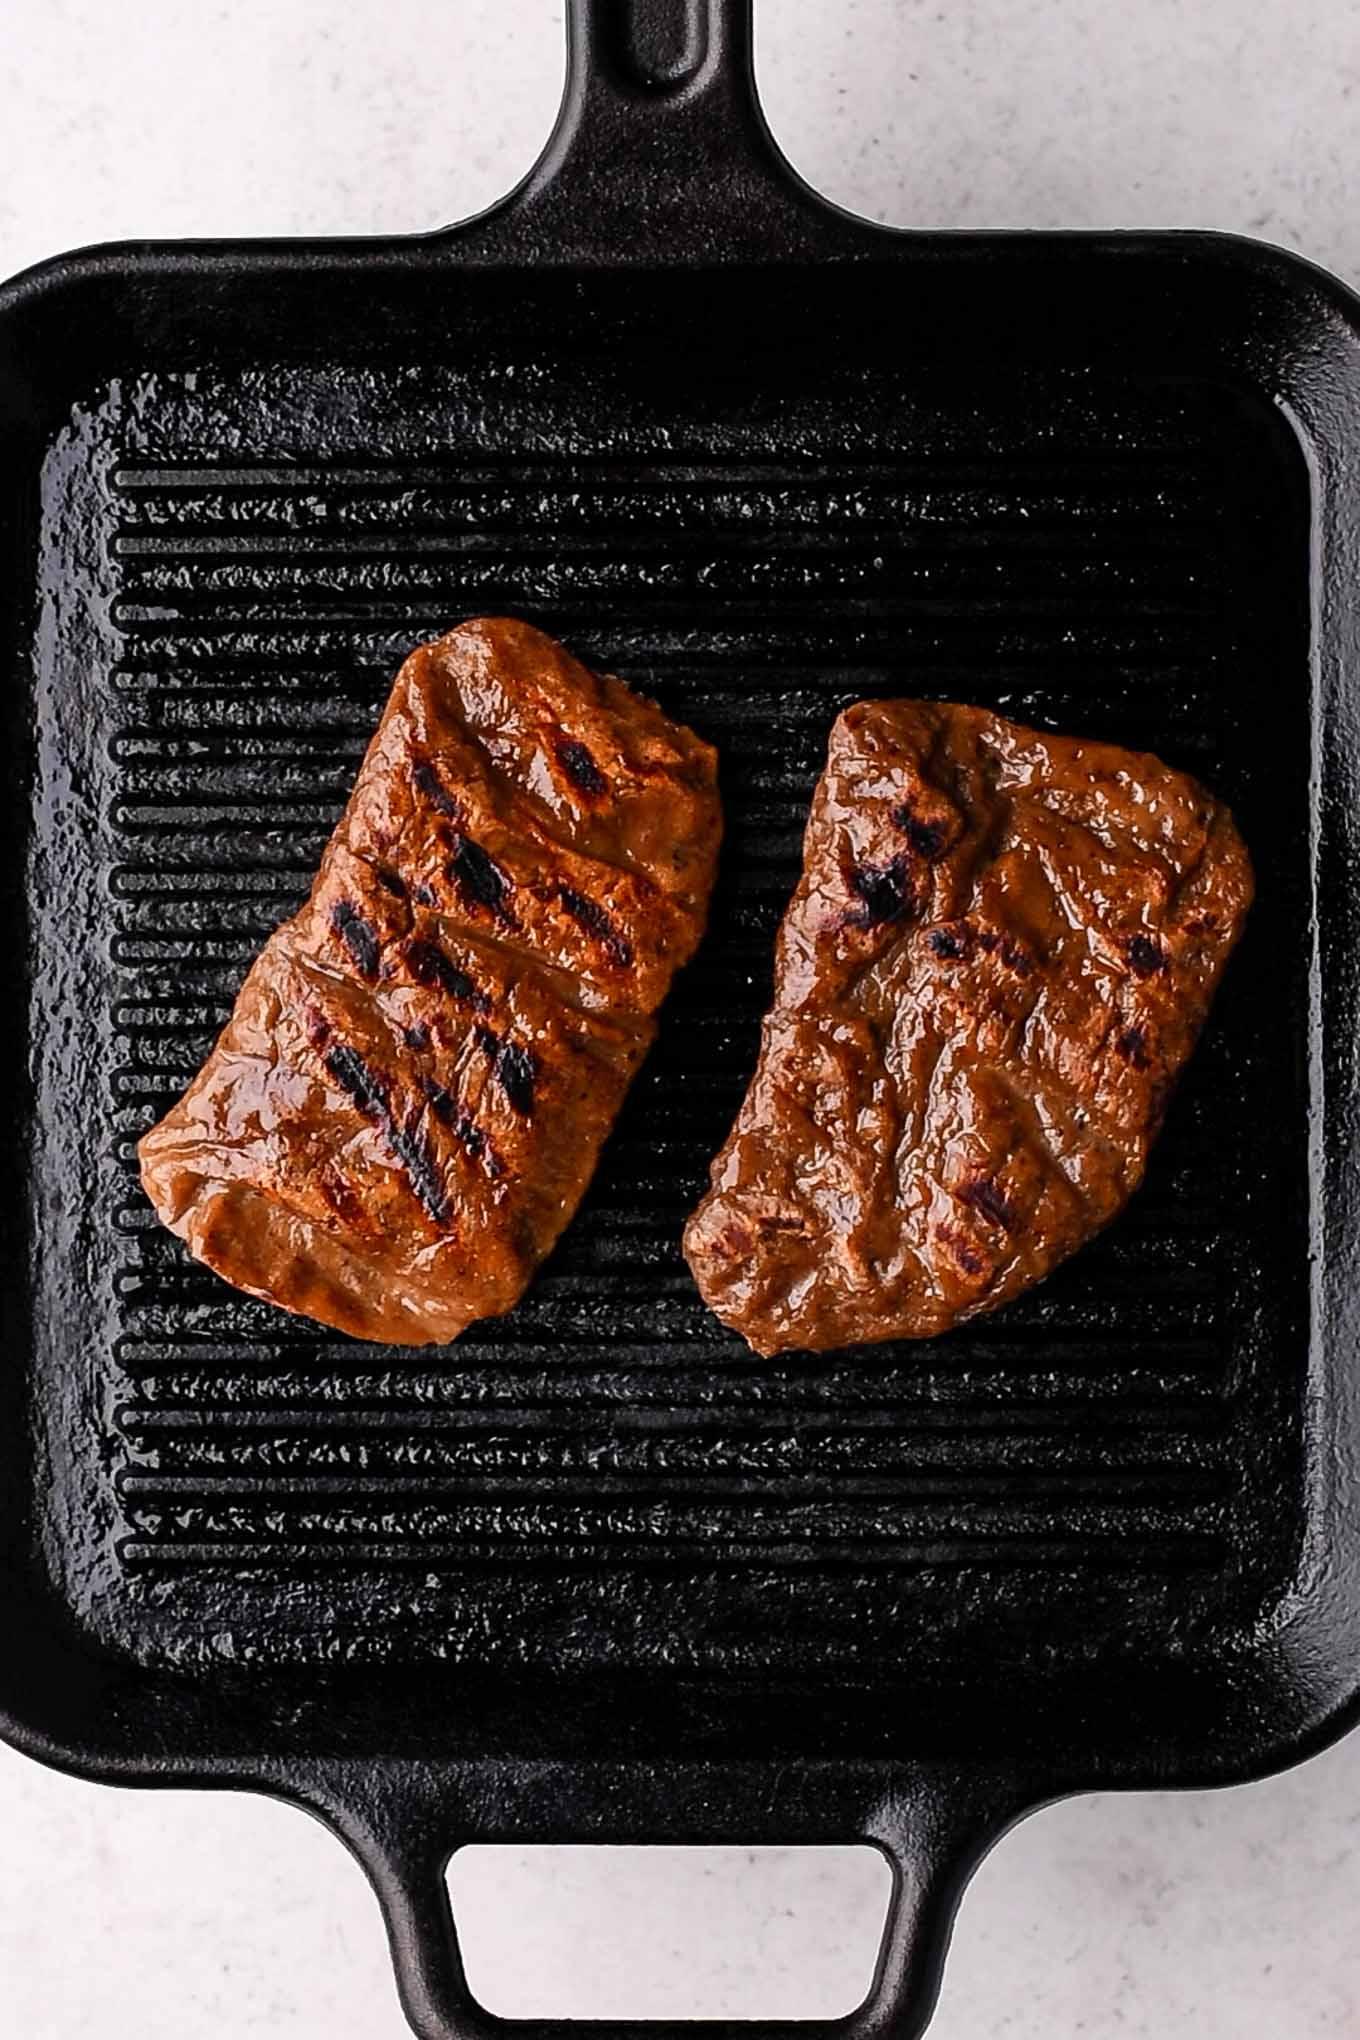 two seitan steaks on grill